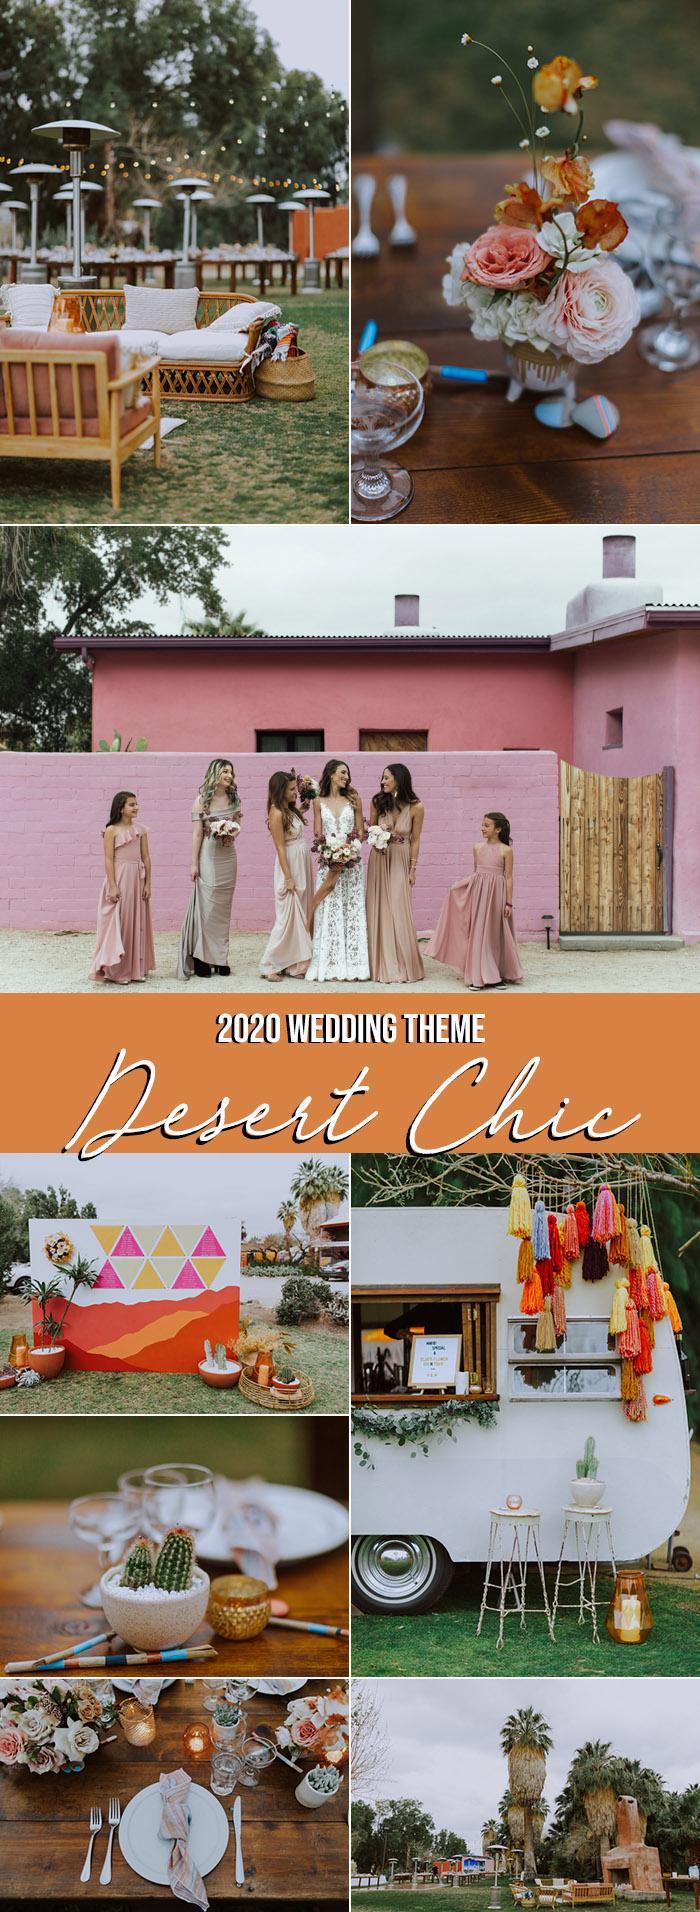 wonderful world of weddings 2020